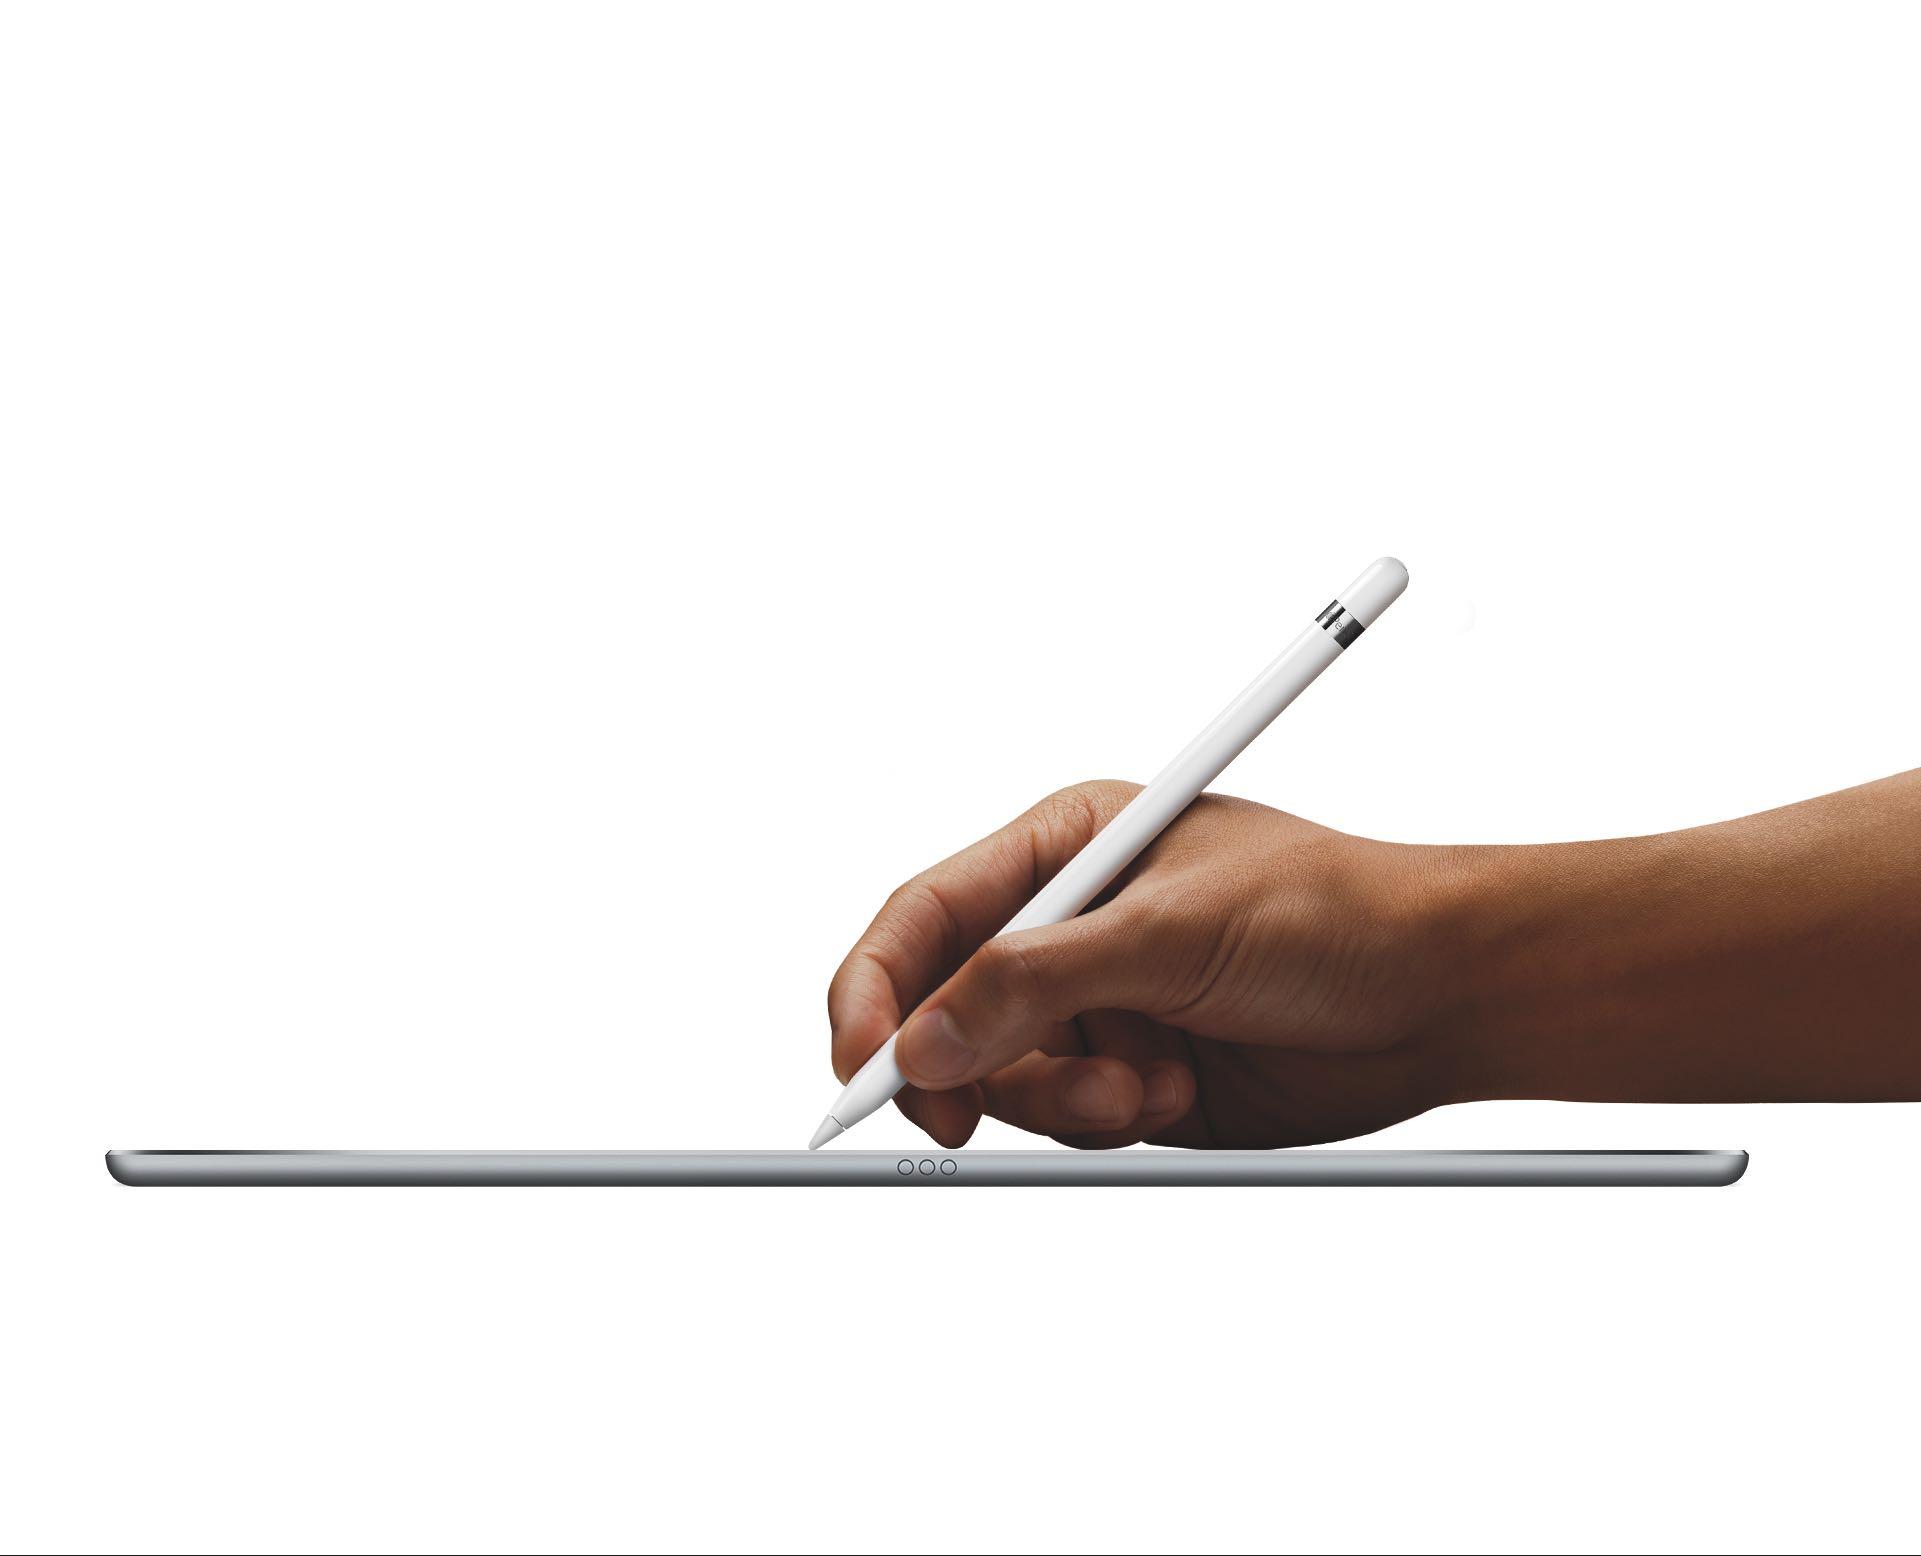 The iPad Pencil - Image Courtesy of Apple